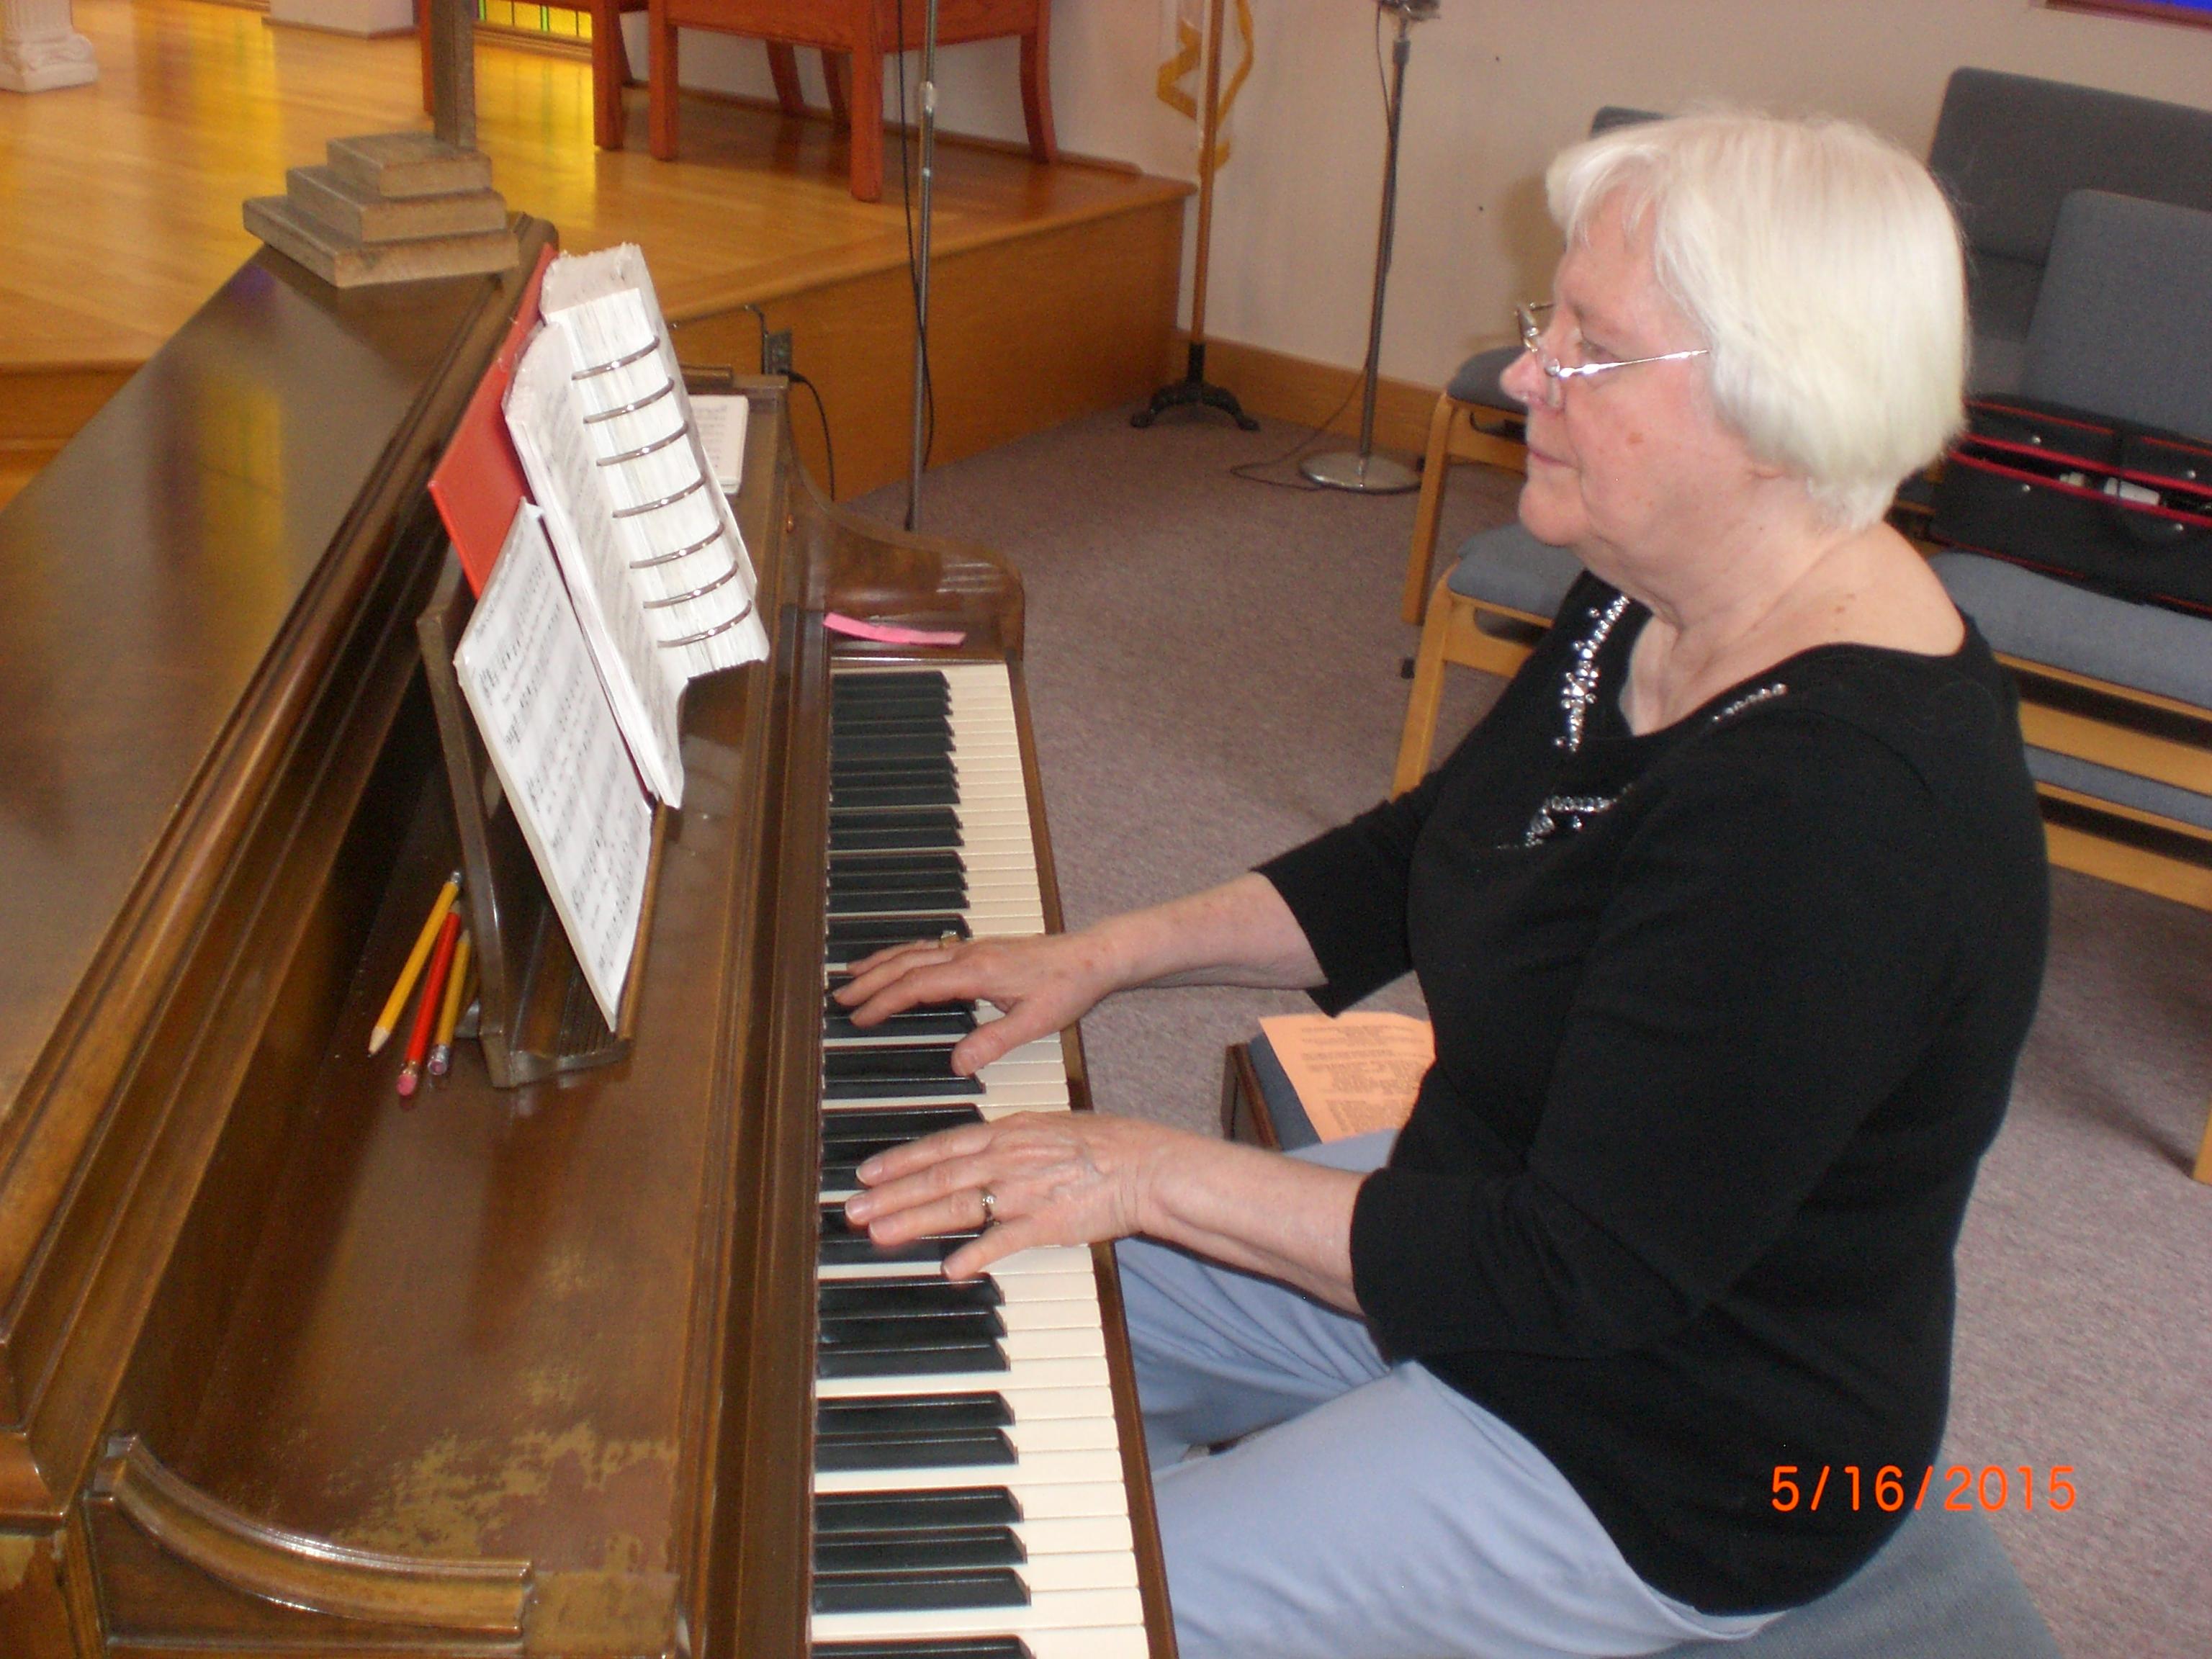 Jane Metcalfe Organist/Pianist